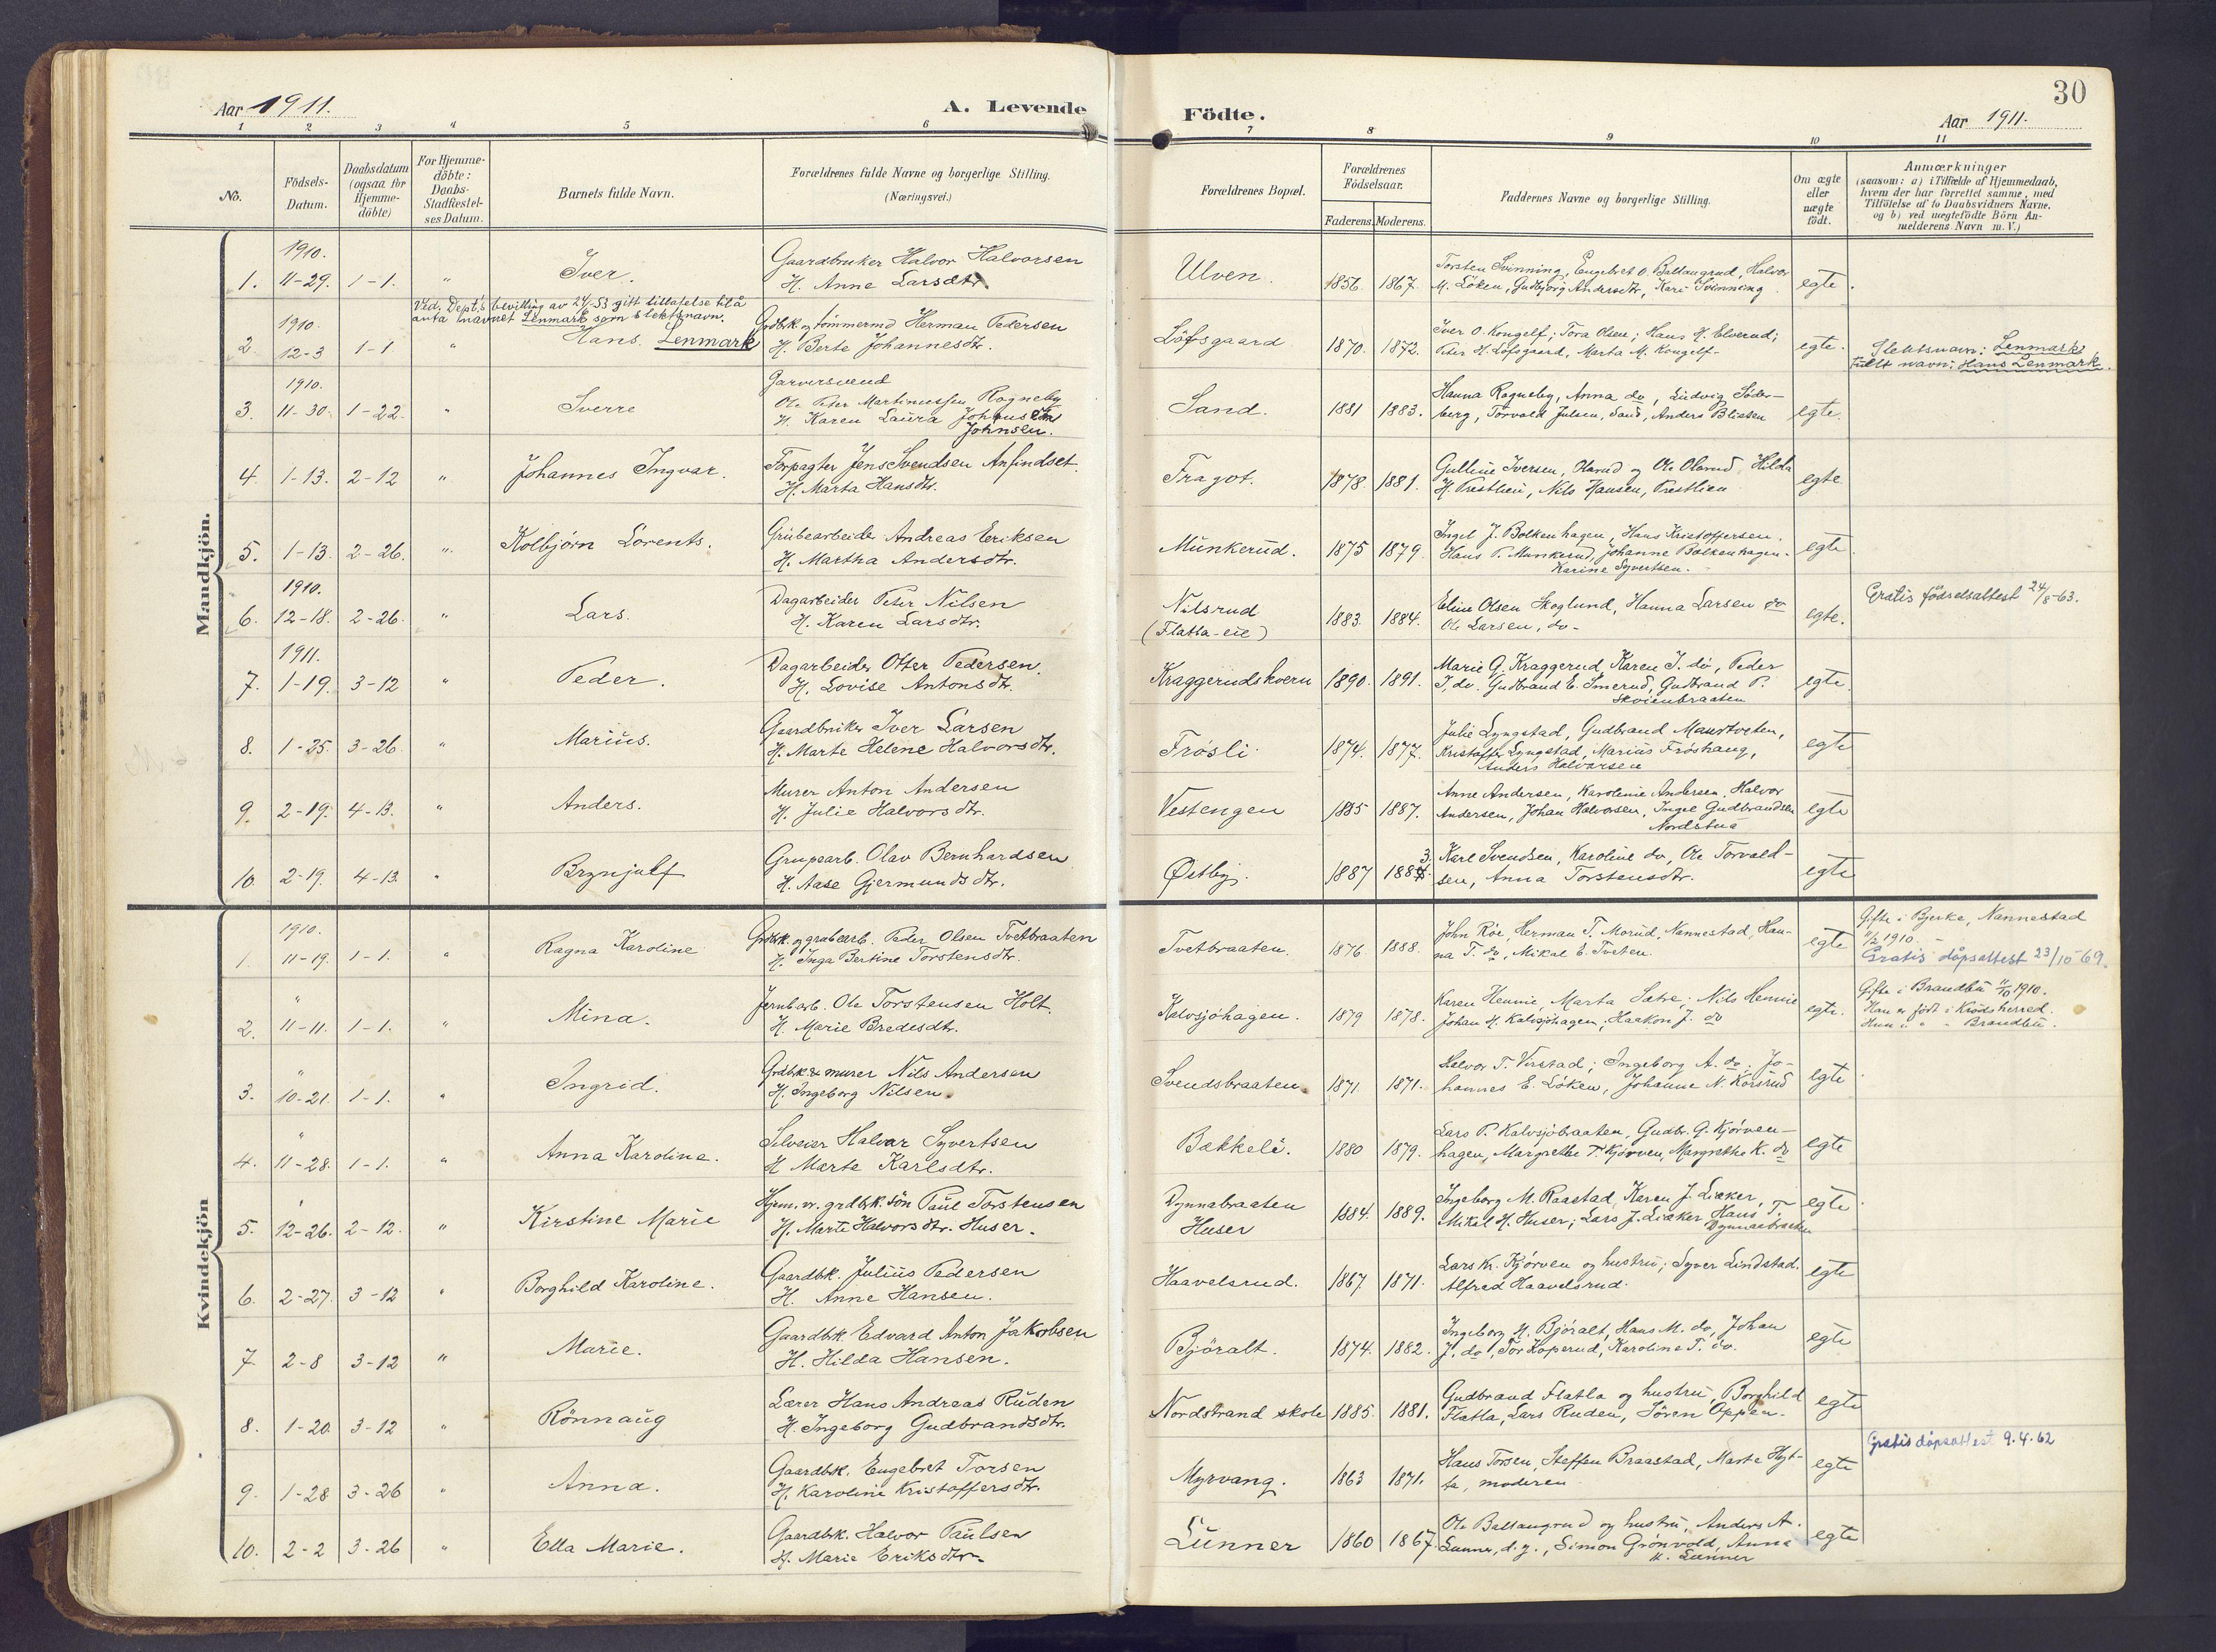 SAH, Lunner prestekontor, H/Ha/Haa/L0001: Ministerialbok nr. 1, 1907-1922, s. 30